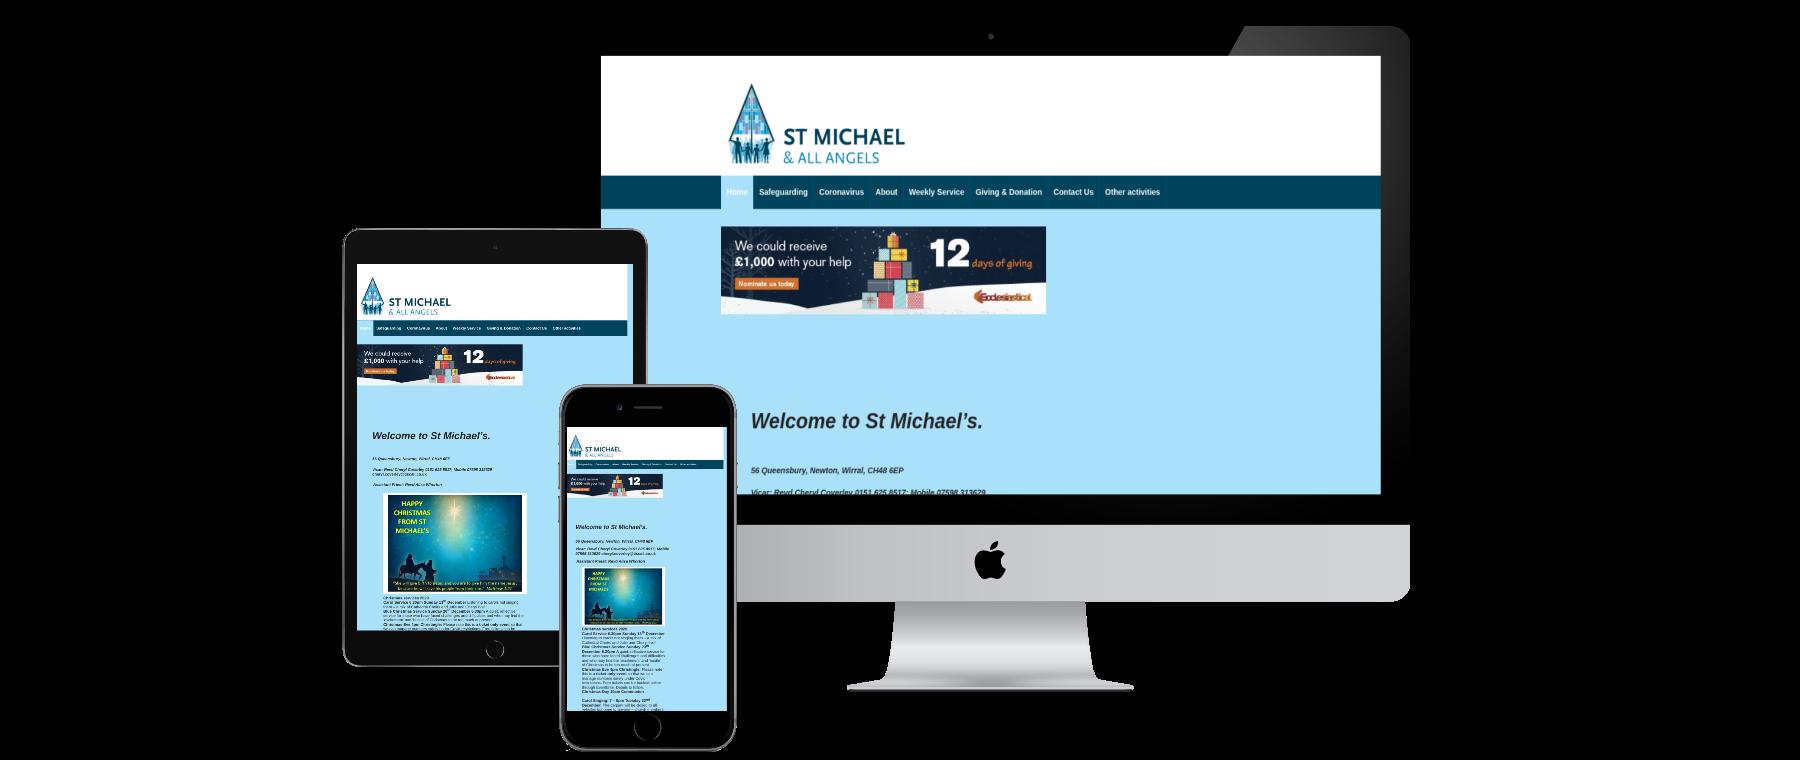 St Michael's - Website Designed by Alba Digital Solutions